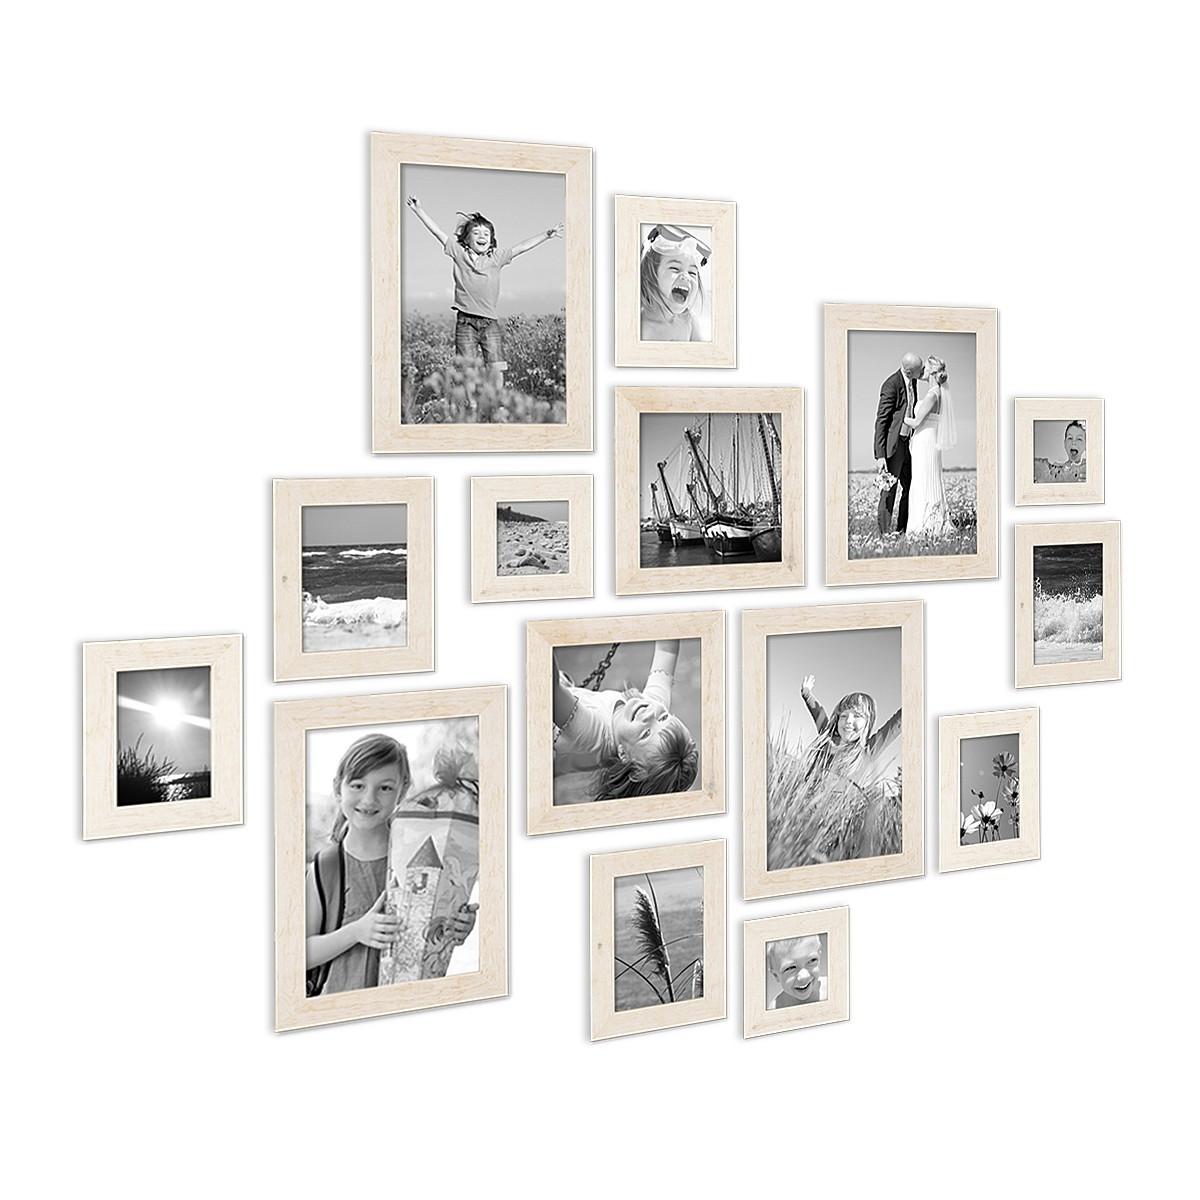 15er Bilderrahmen-Set Strandhaus Rustikal Weiss Massivholz 10x15 bis ...